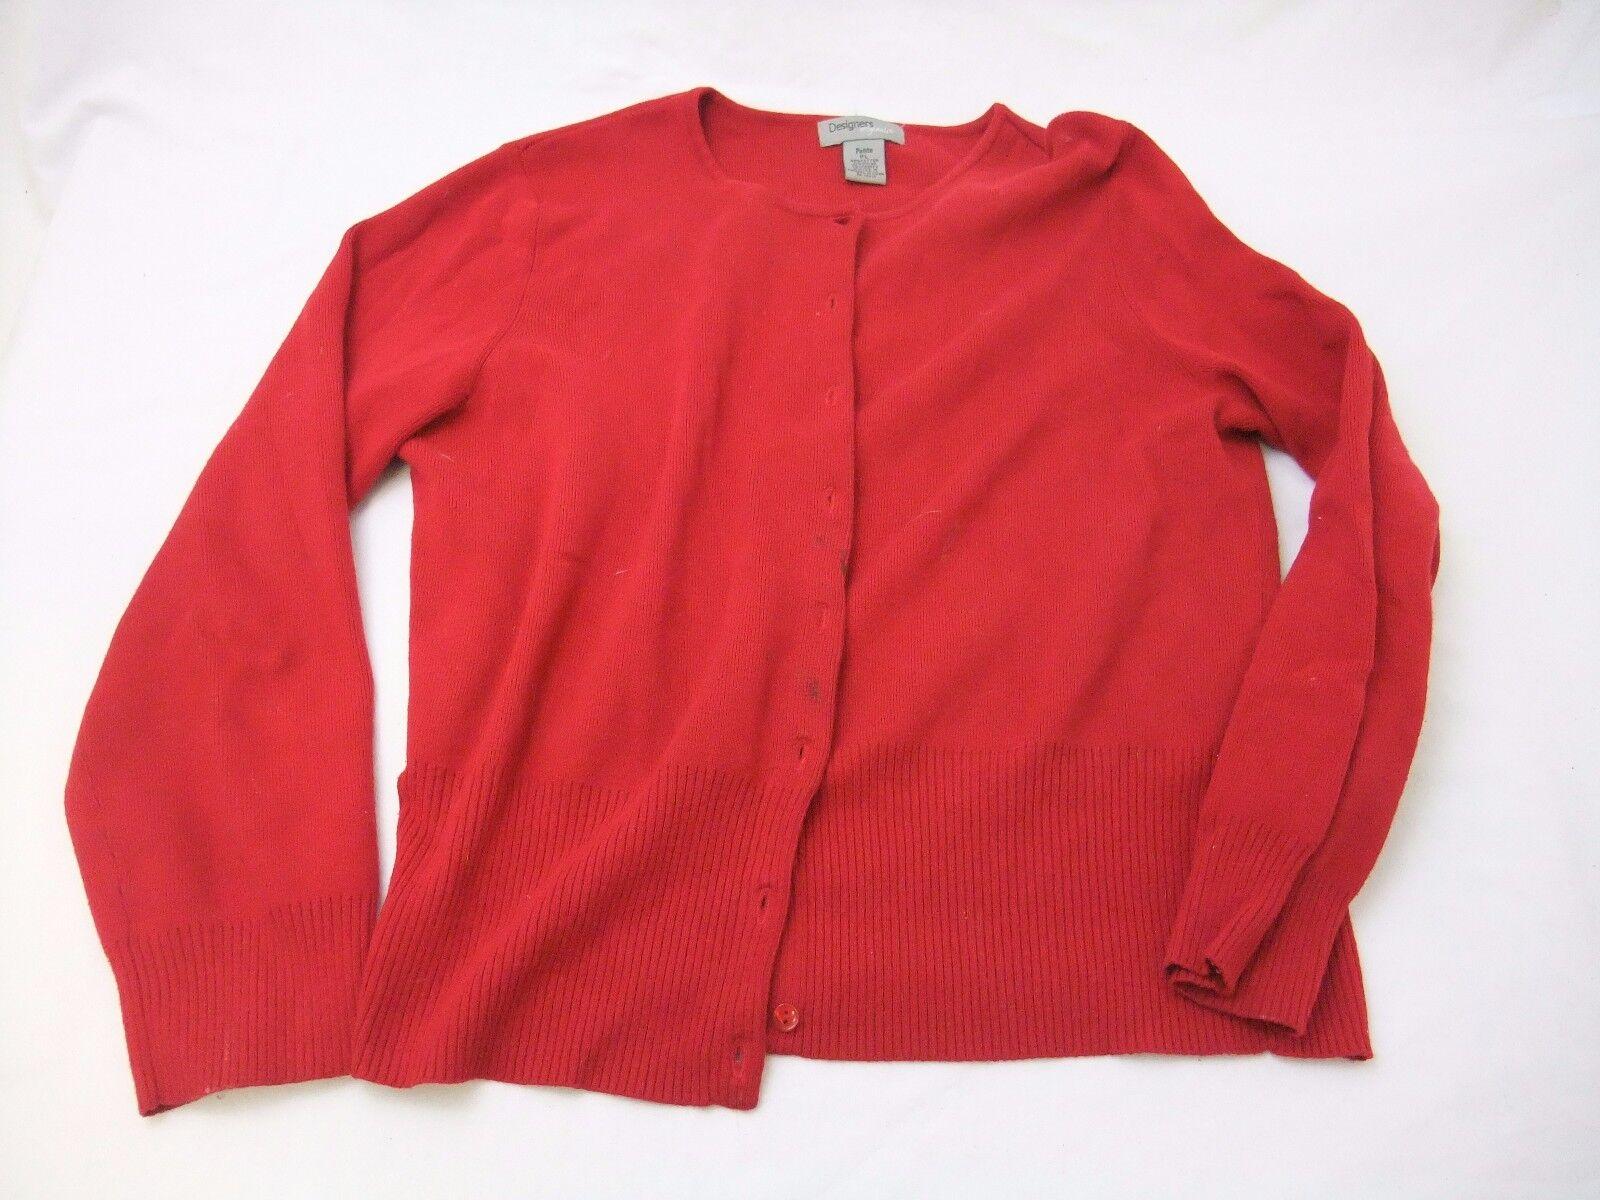 Vintage Designers Originals Women's Red Cardigan Sweater Size PL